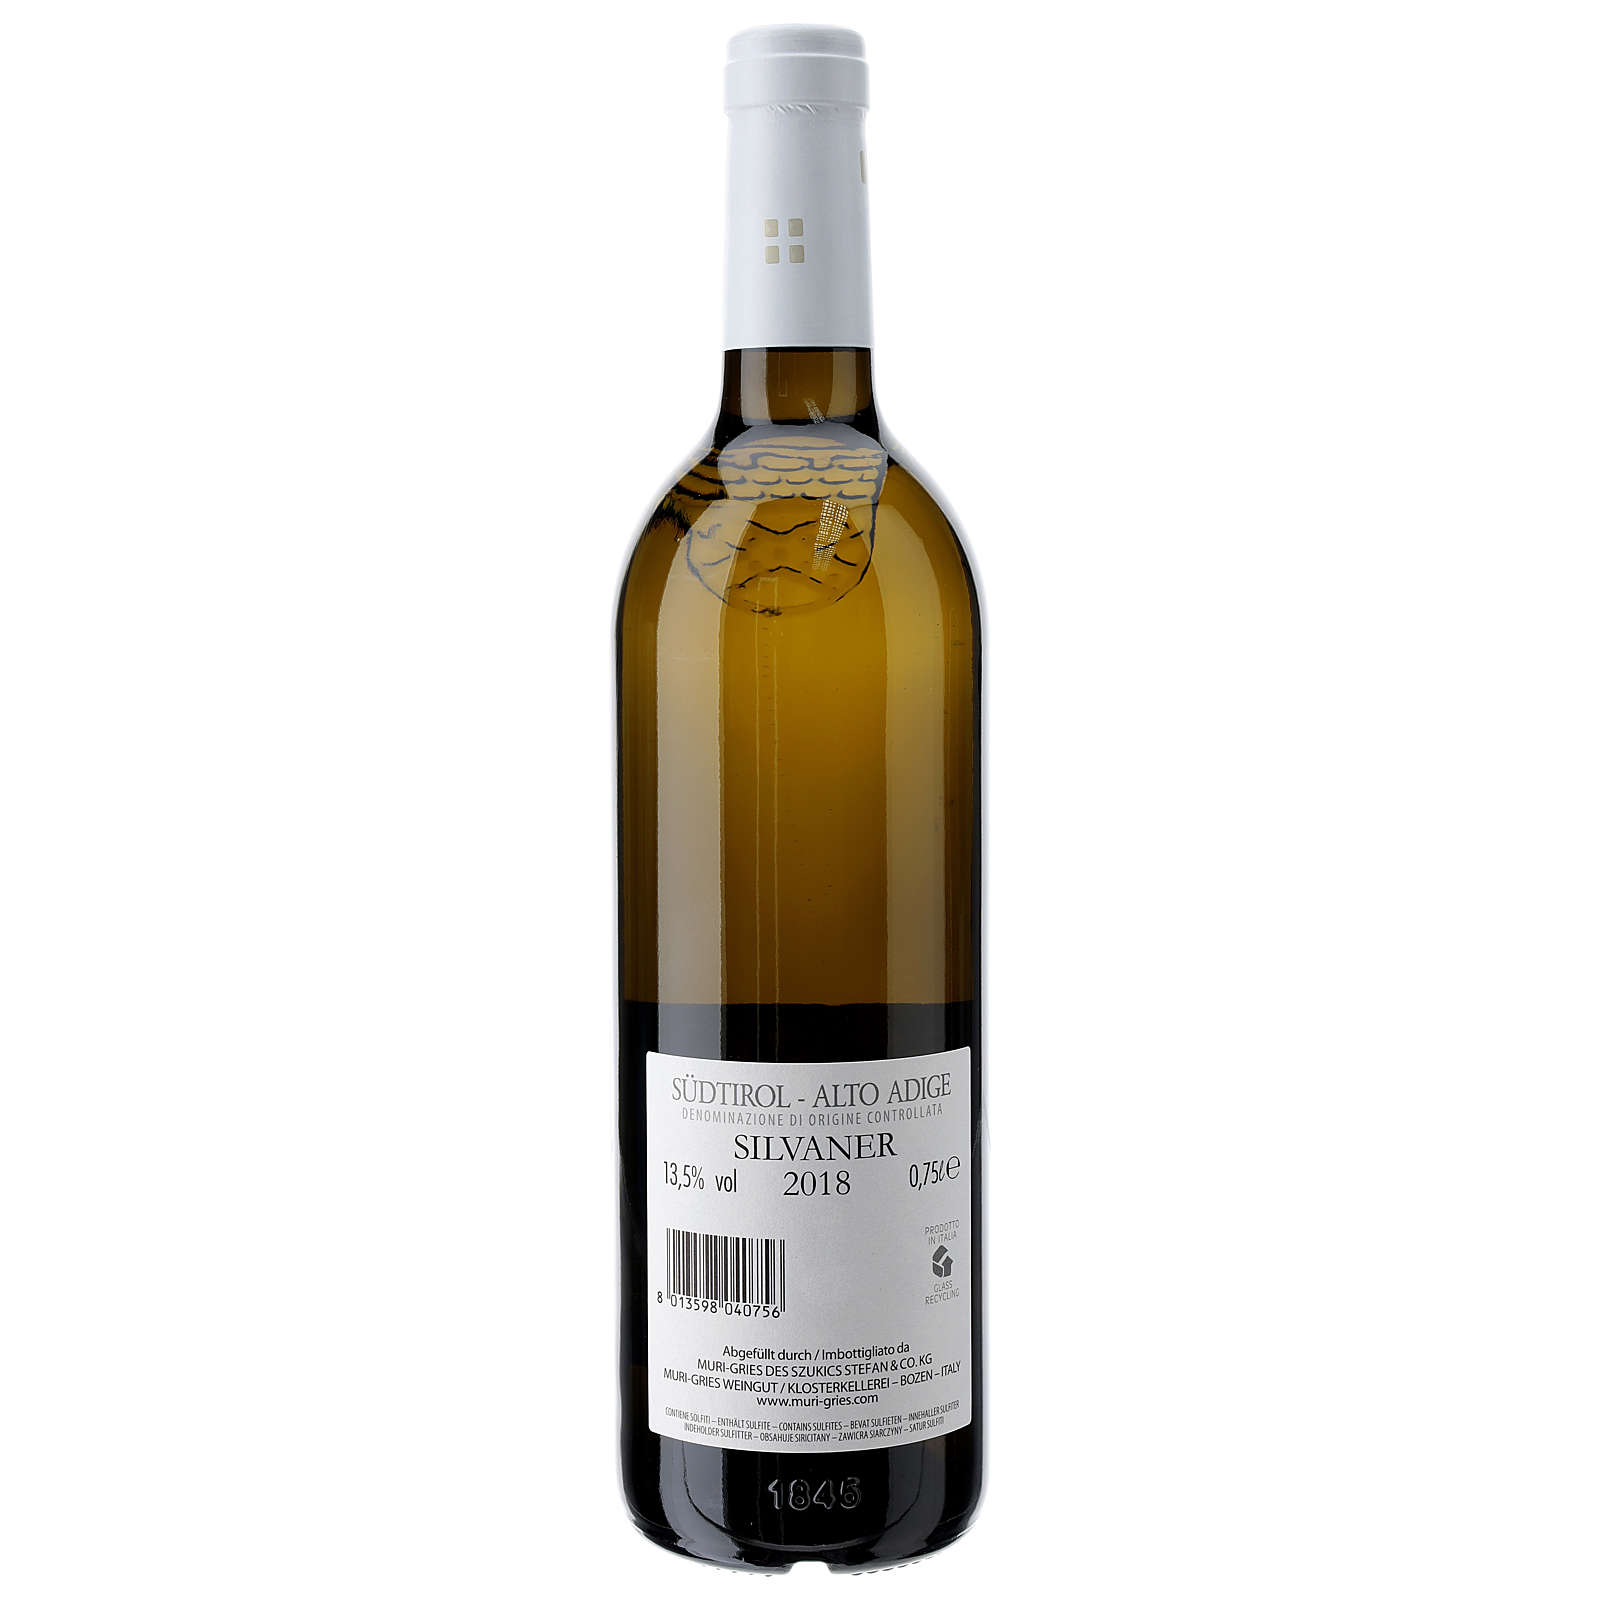 Vinho Silvaner DOC 2018 Abadia Muri Gries 750 ml 3